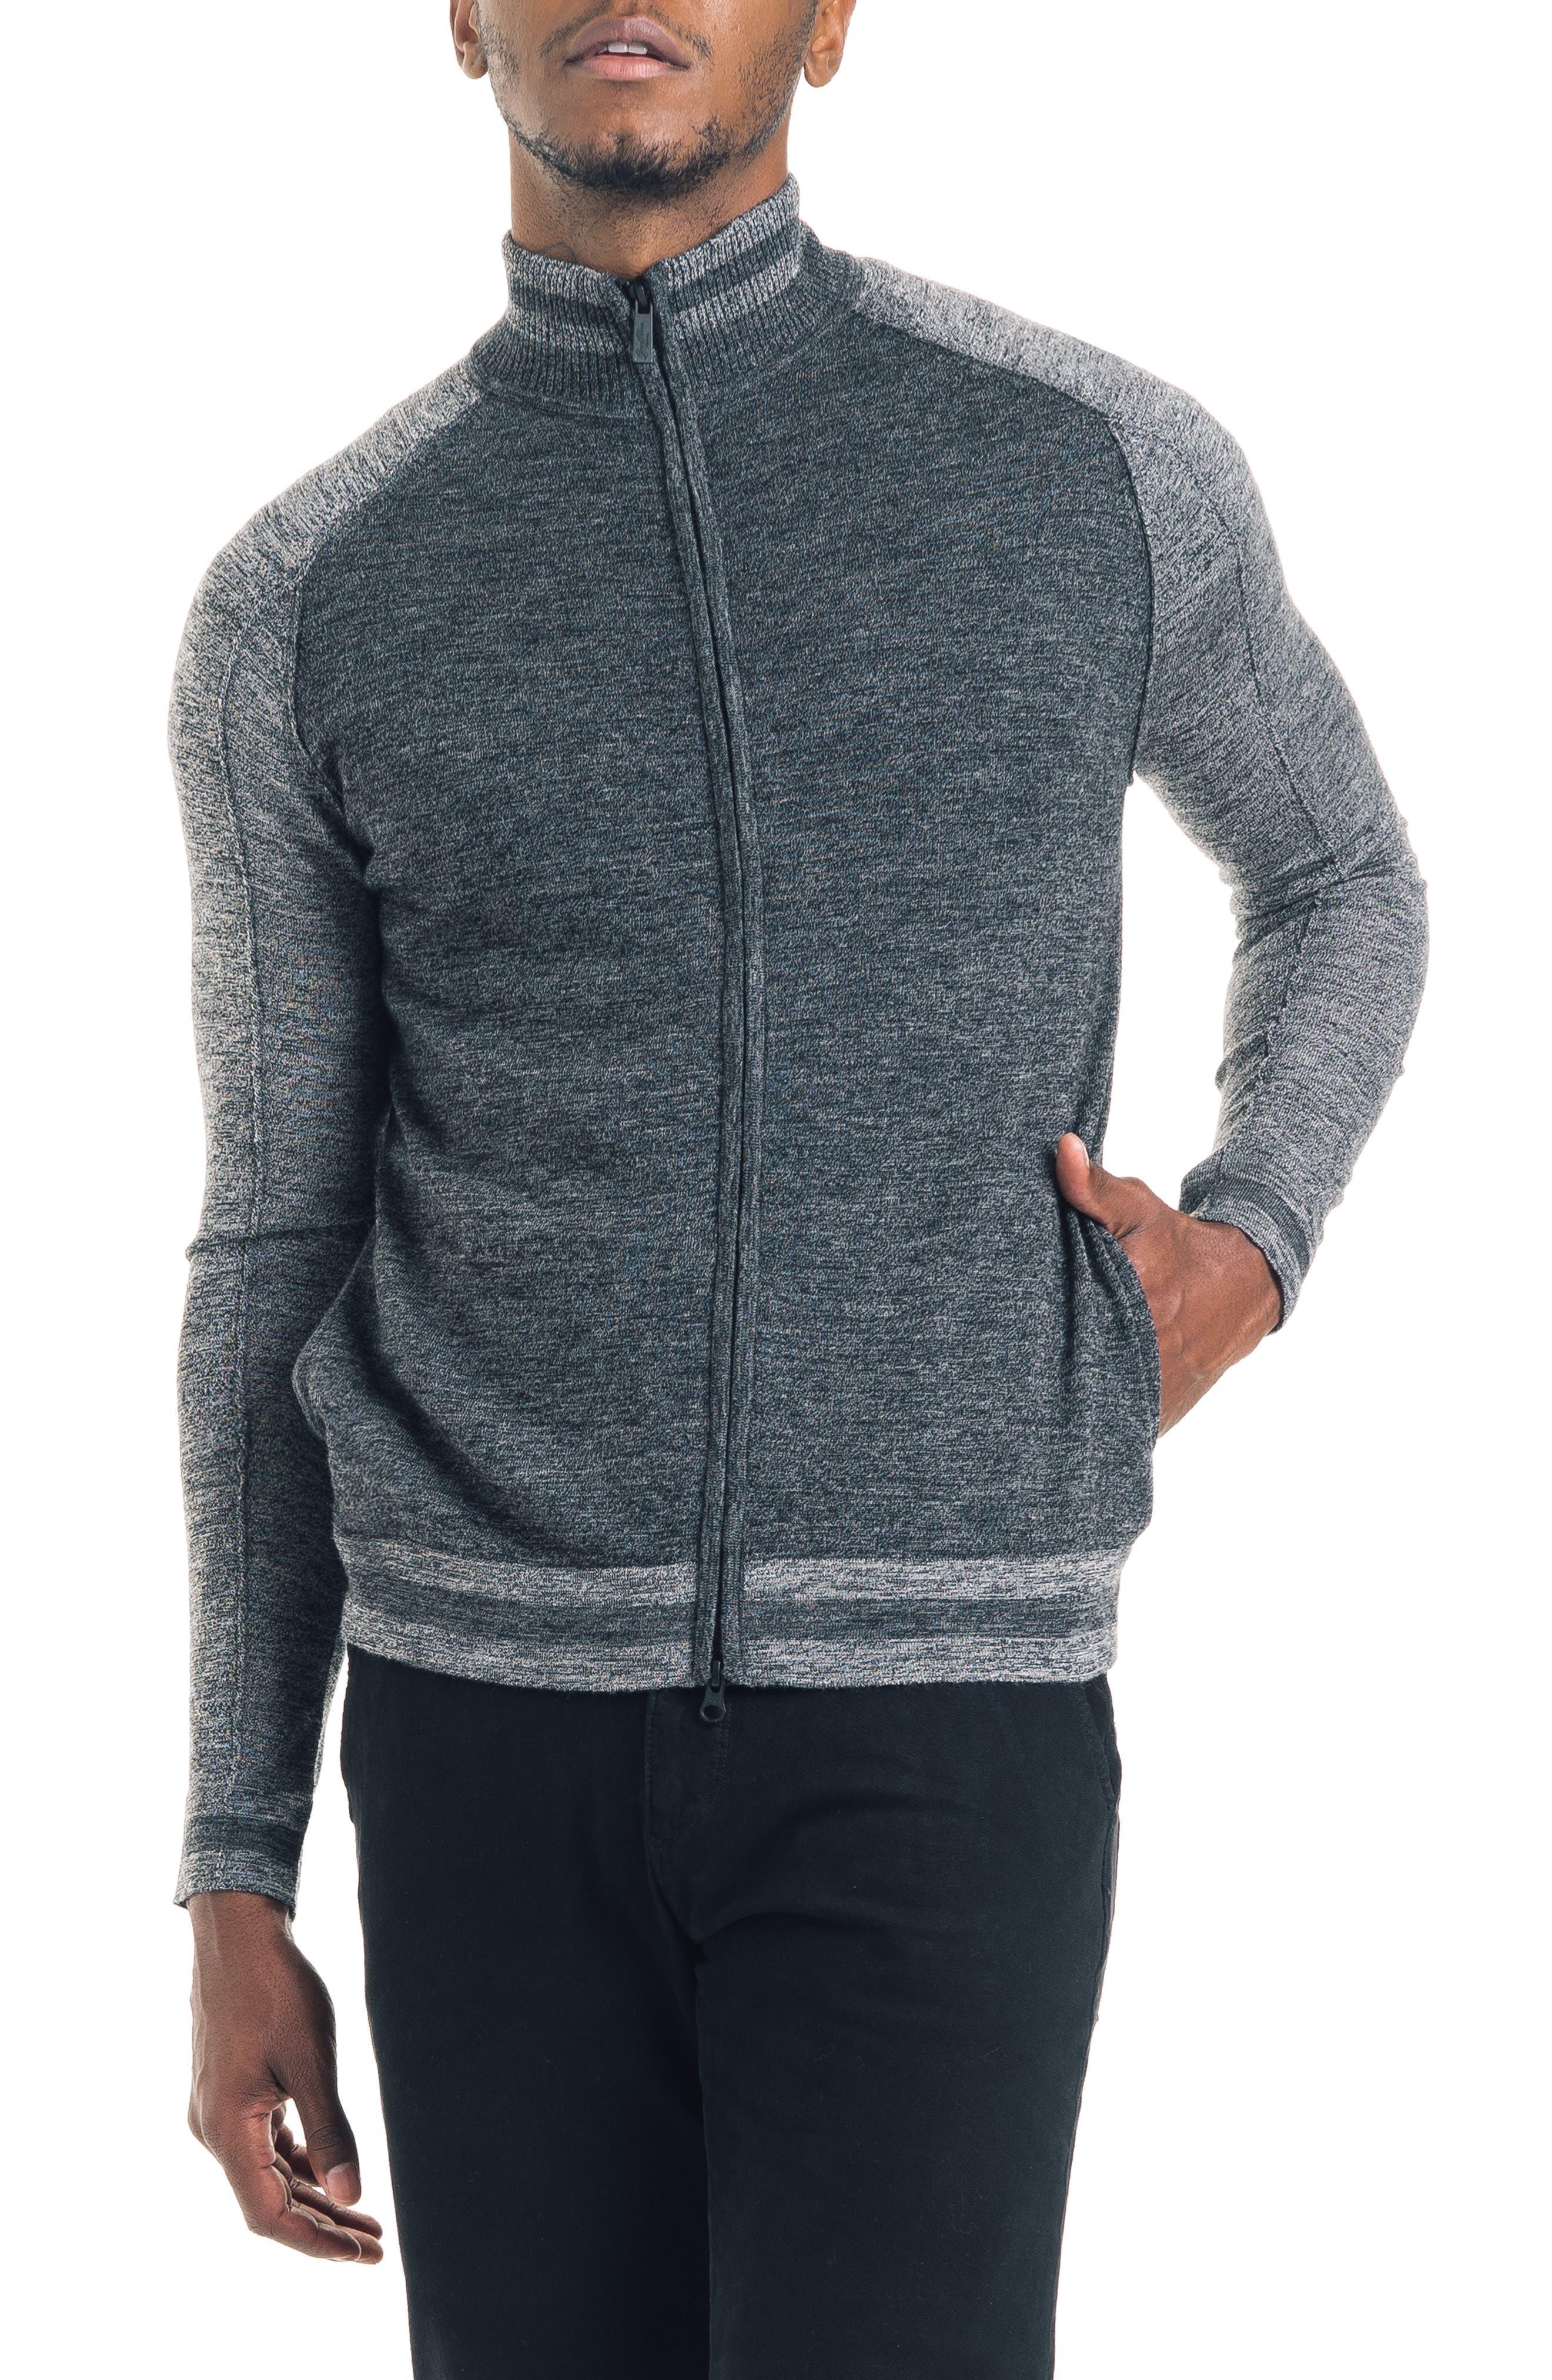 Good Man Brand Modern Slim Fit Merino Wool Track Jacket, Grey